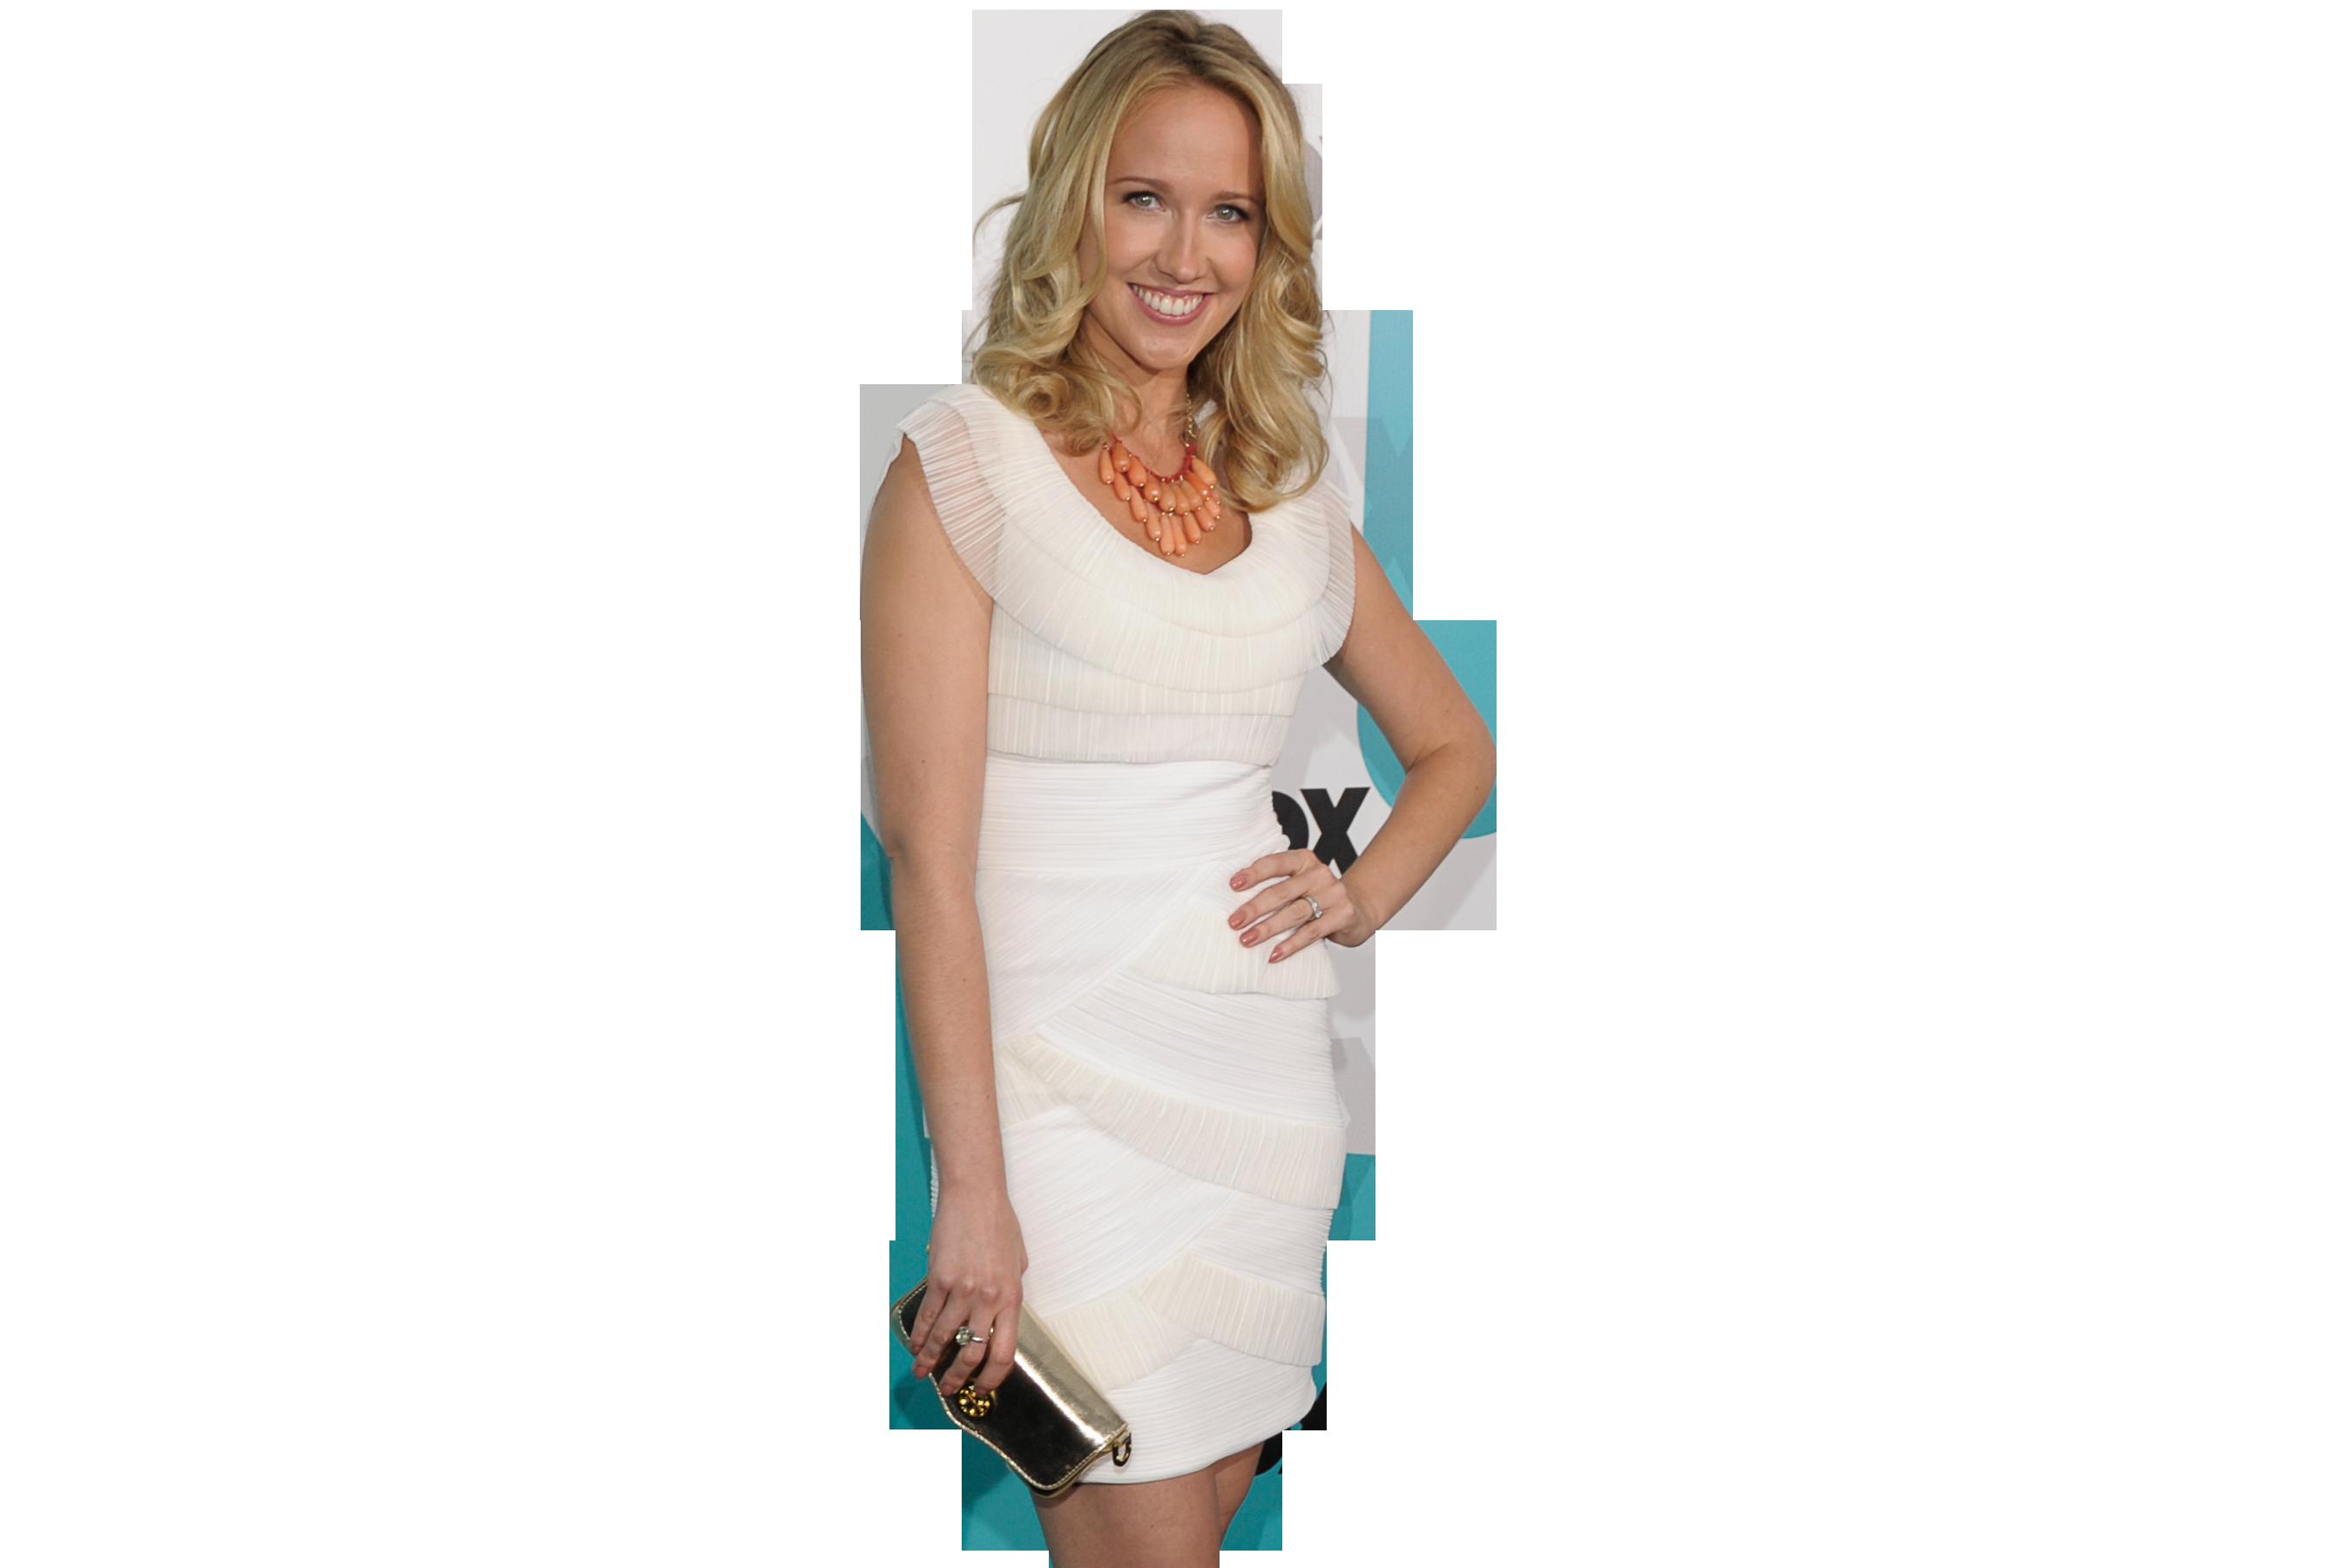 Anna Camp in White Dress Hd Wallpaper Wallpaper 2700x1800